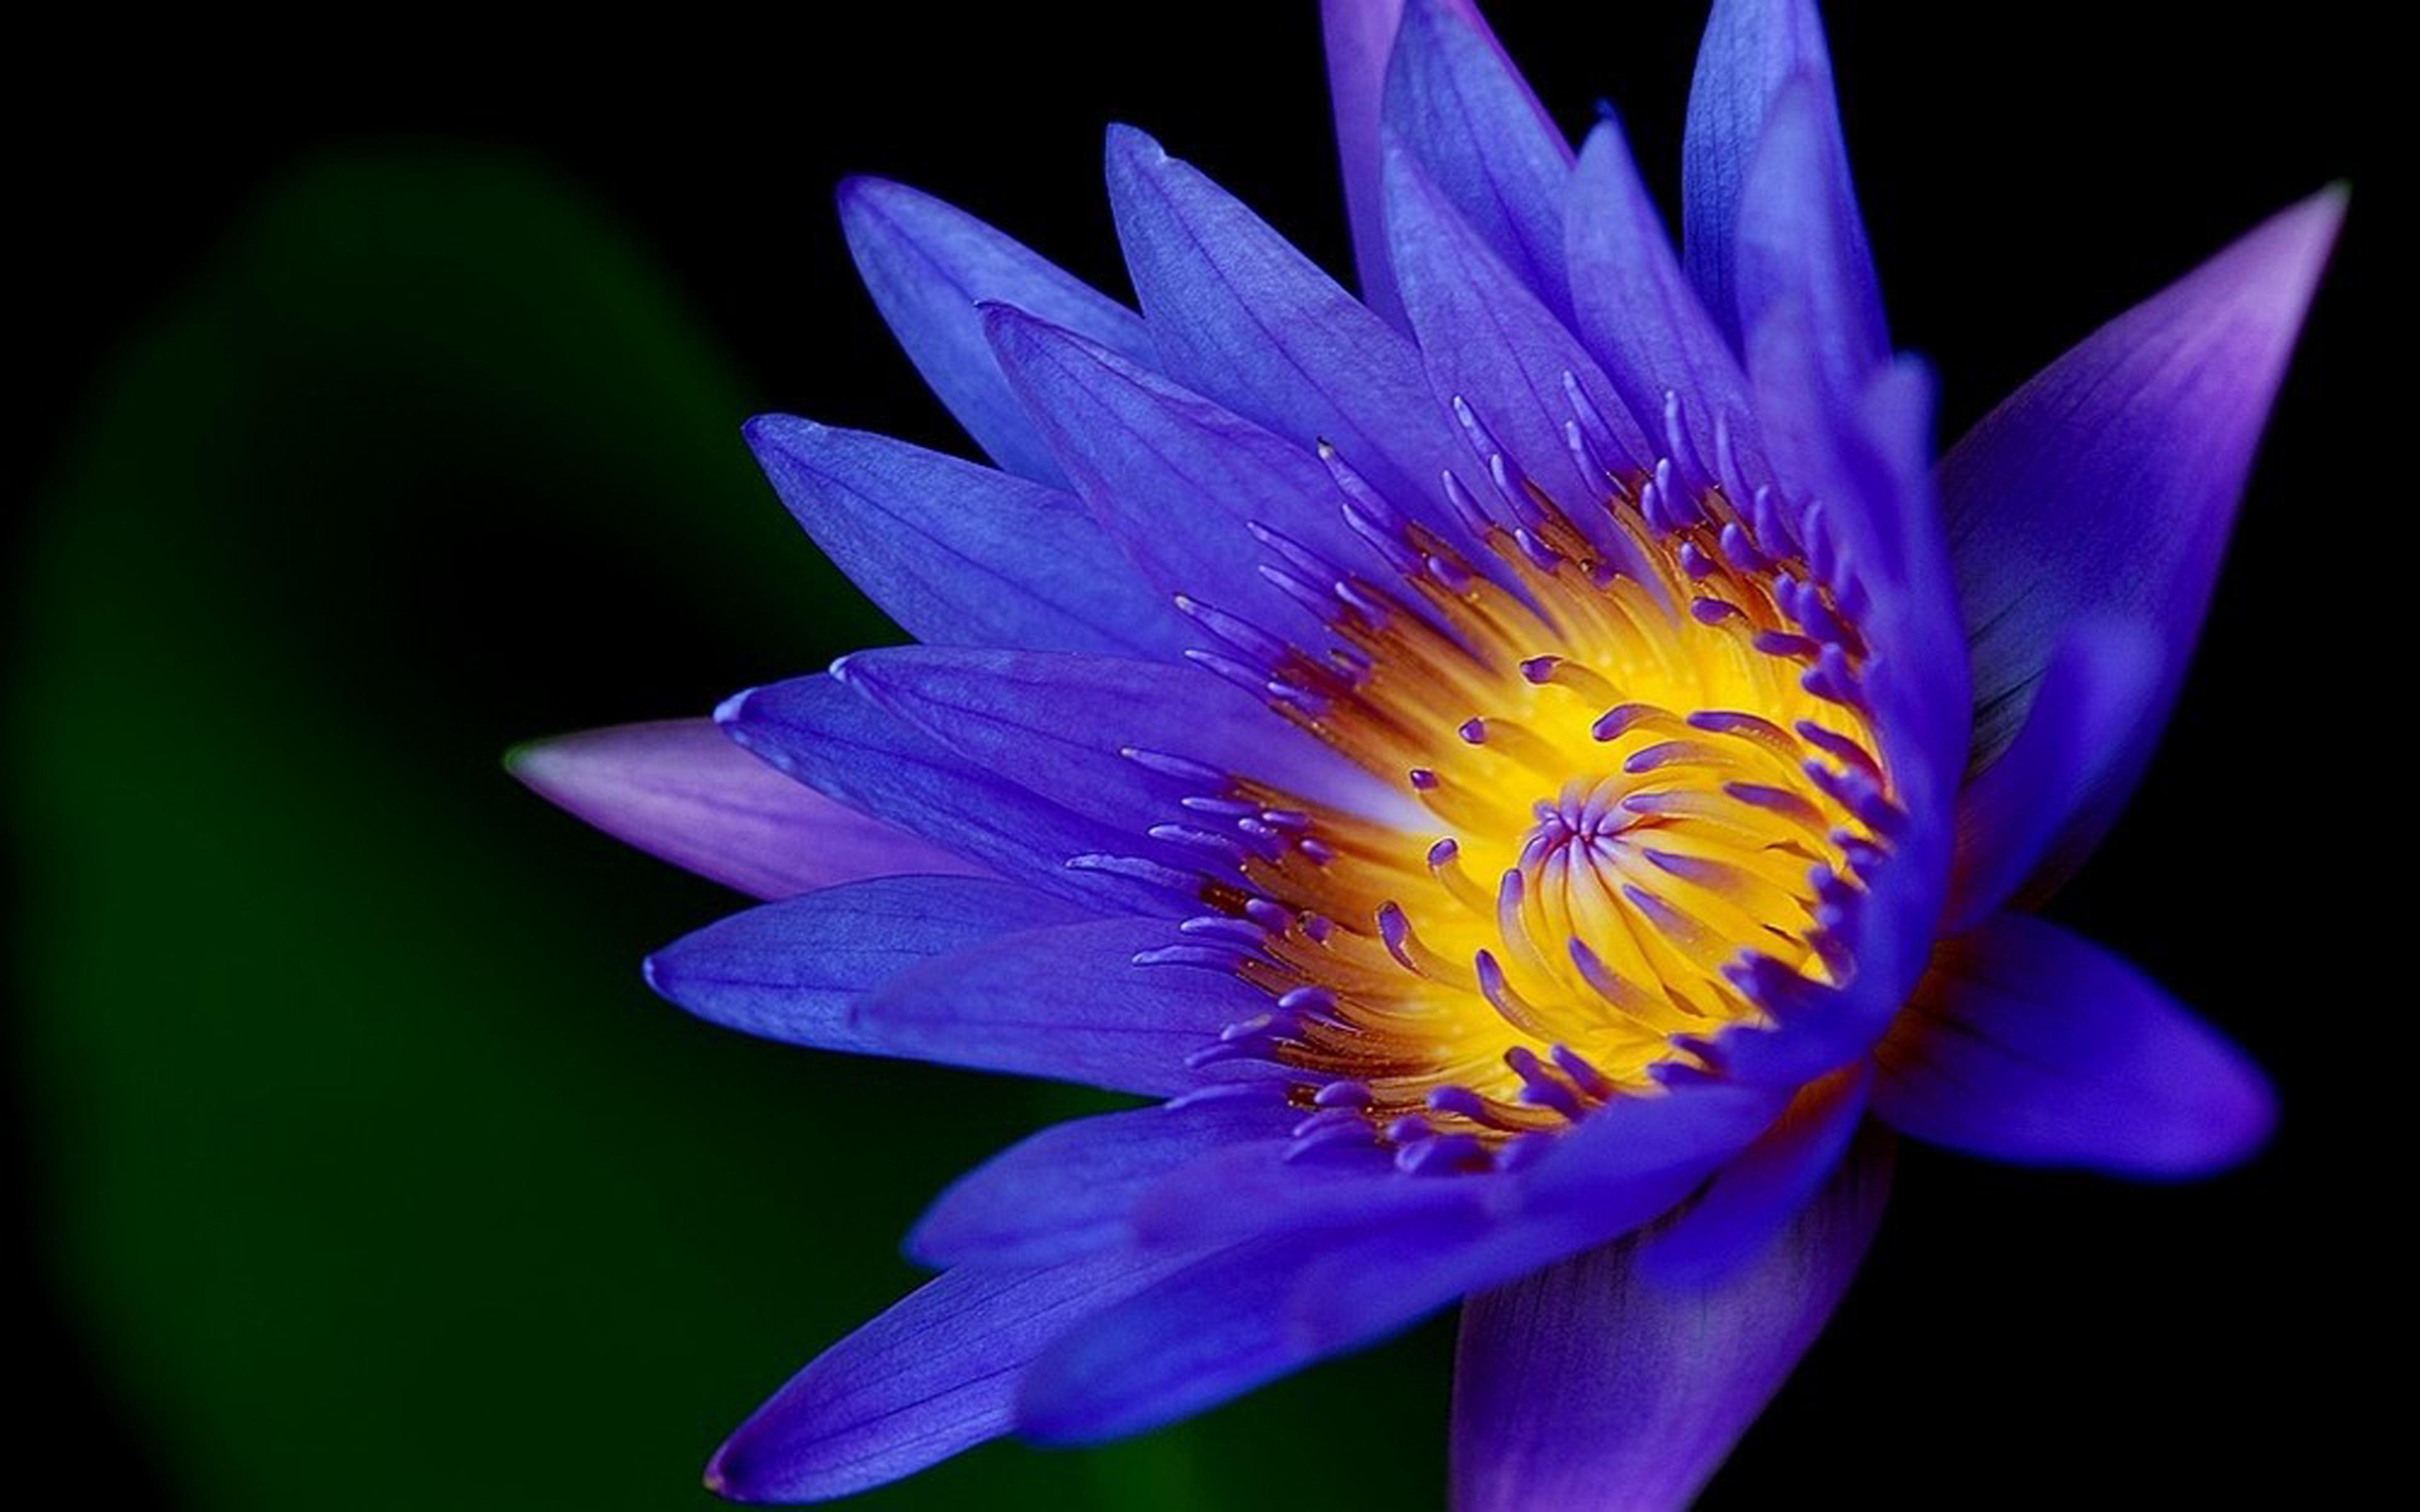 Iphone 6 Orange Flower Wallpaper Lotus Flower Dark Blue Color Hd Wallpapers For Mobile